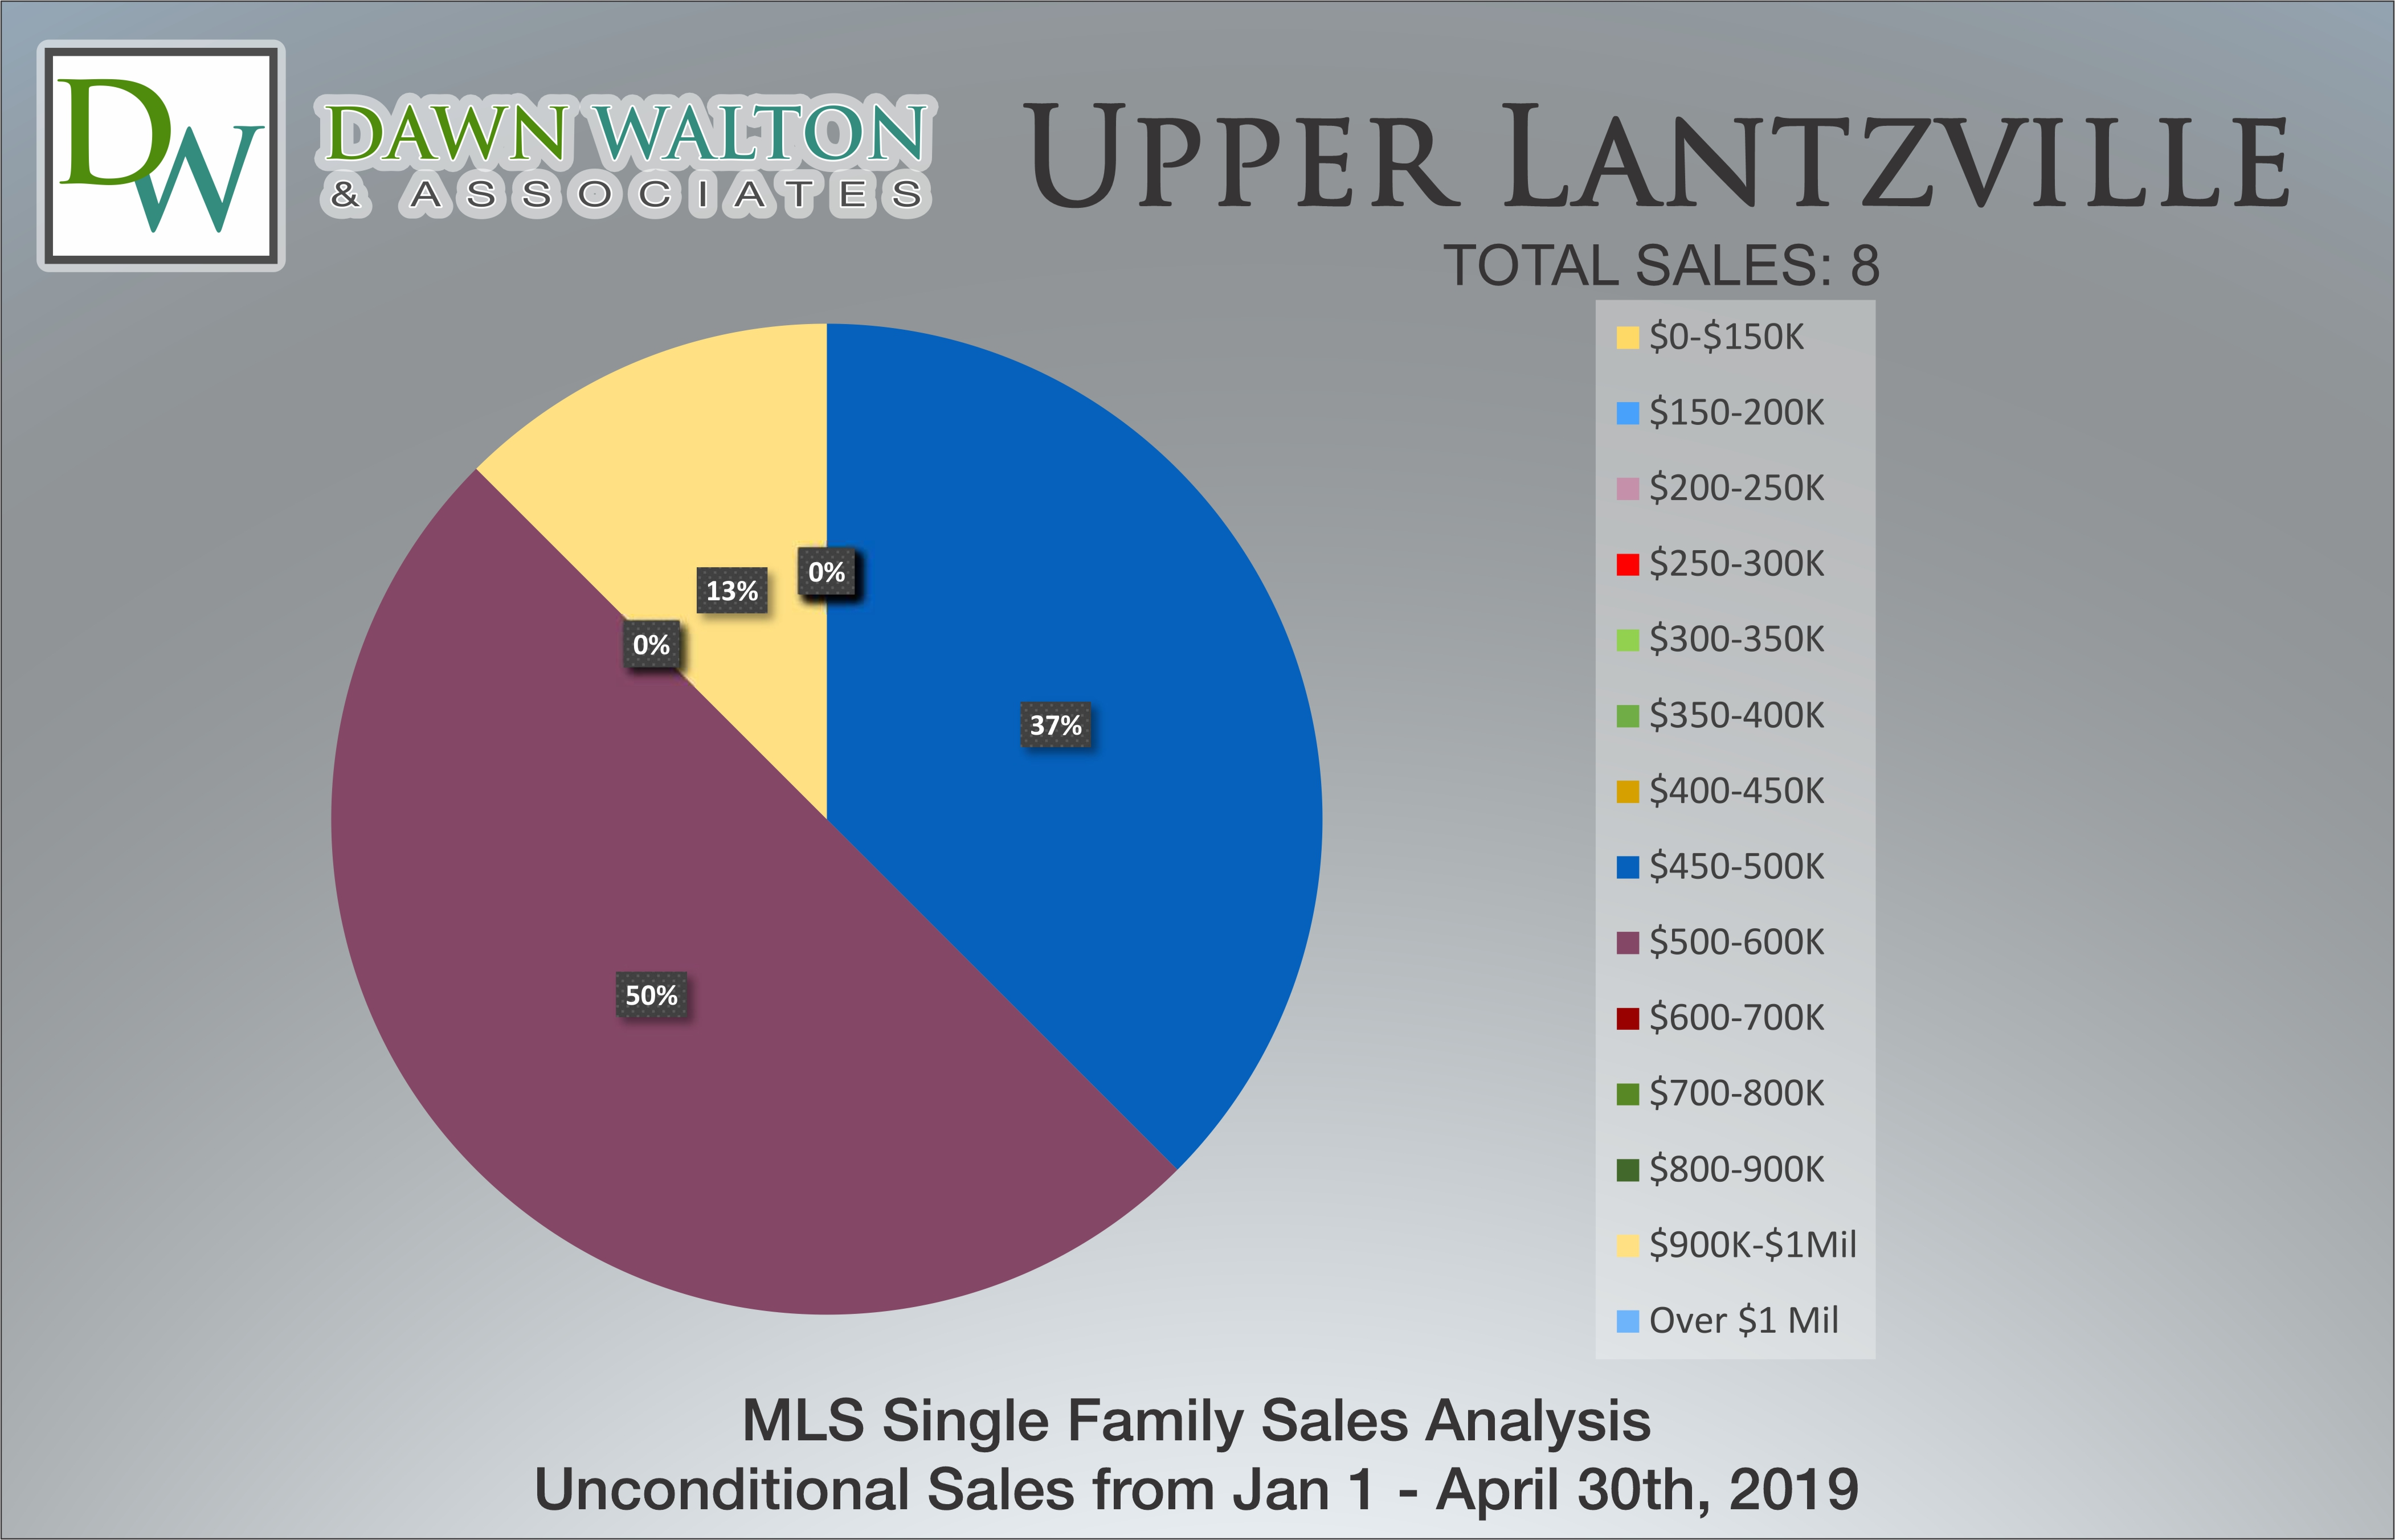 Upper Lantzville Real Estate Market Stats Price Percentage Jan 1 - April 30, 2019 - Nanaimo Realtor Dawn Walton